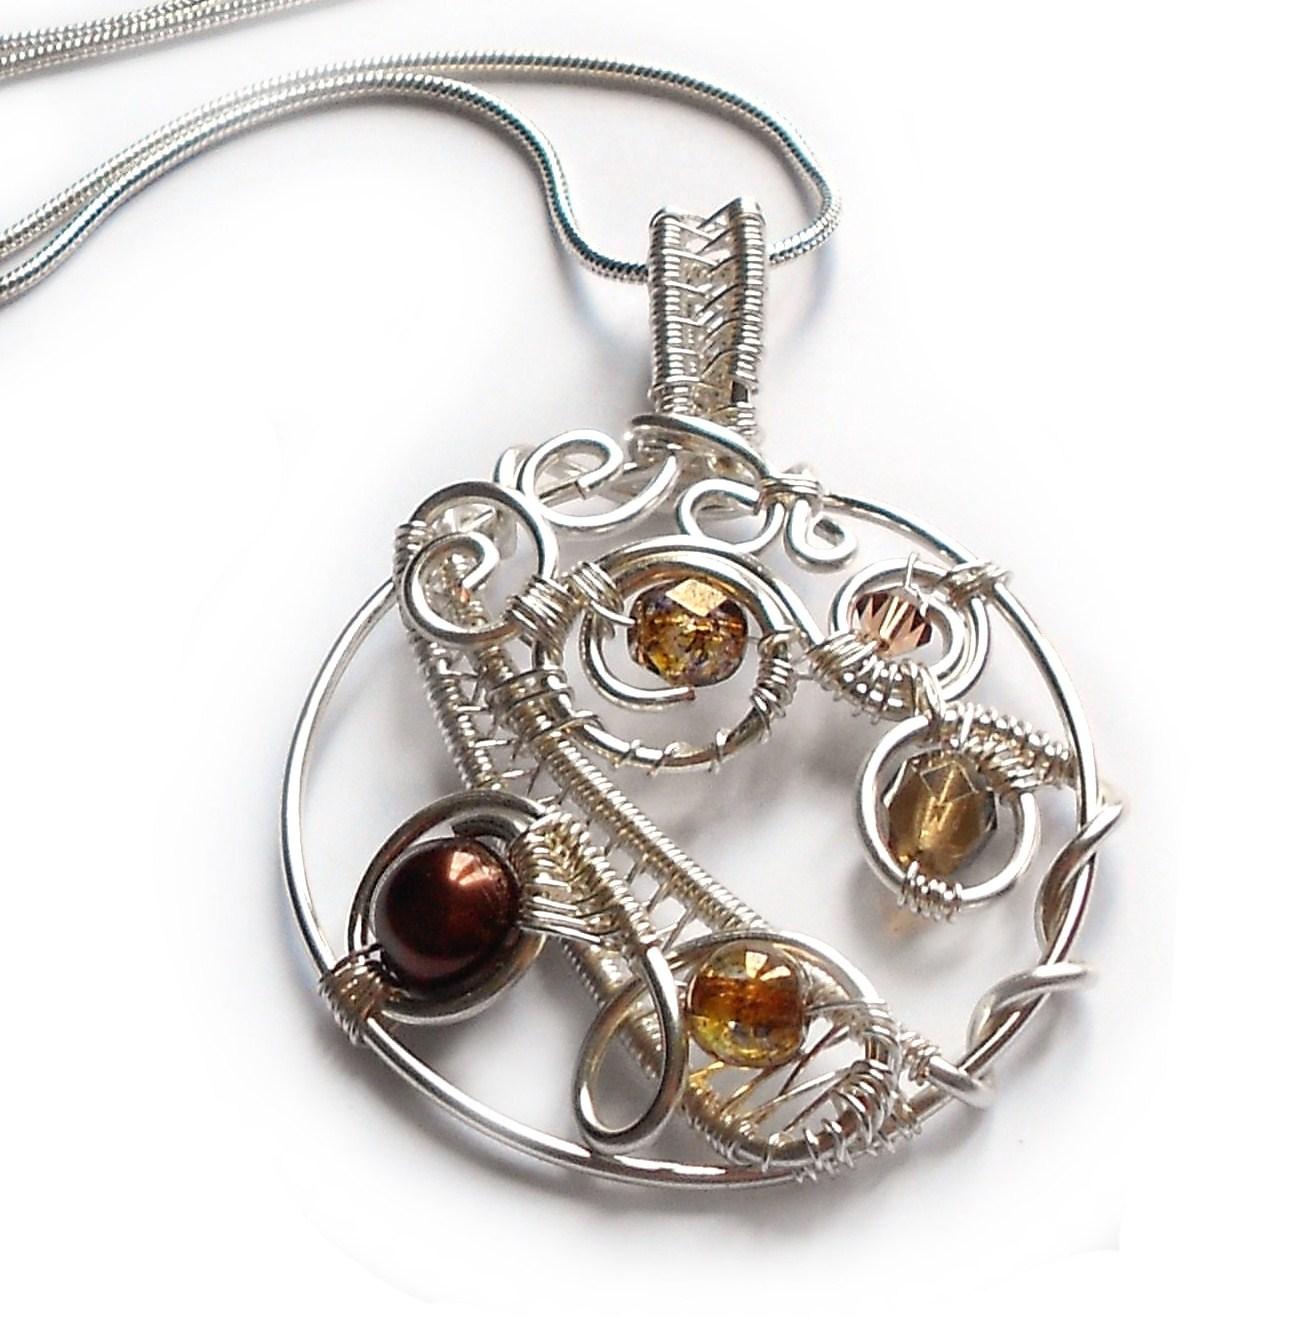 Vintage Wire Chain Jewelry Making Brass Chain Custom: Jewelry Making Journal